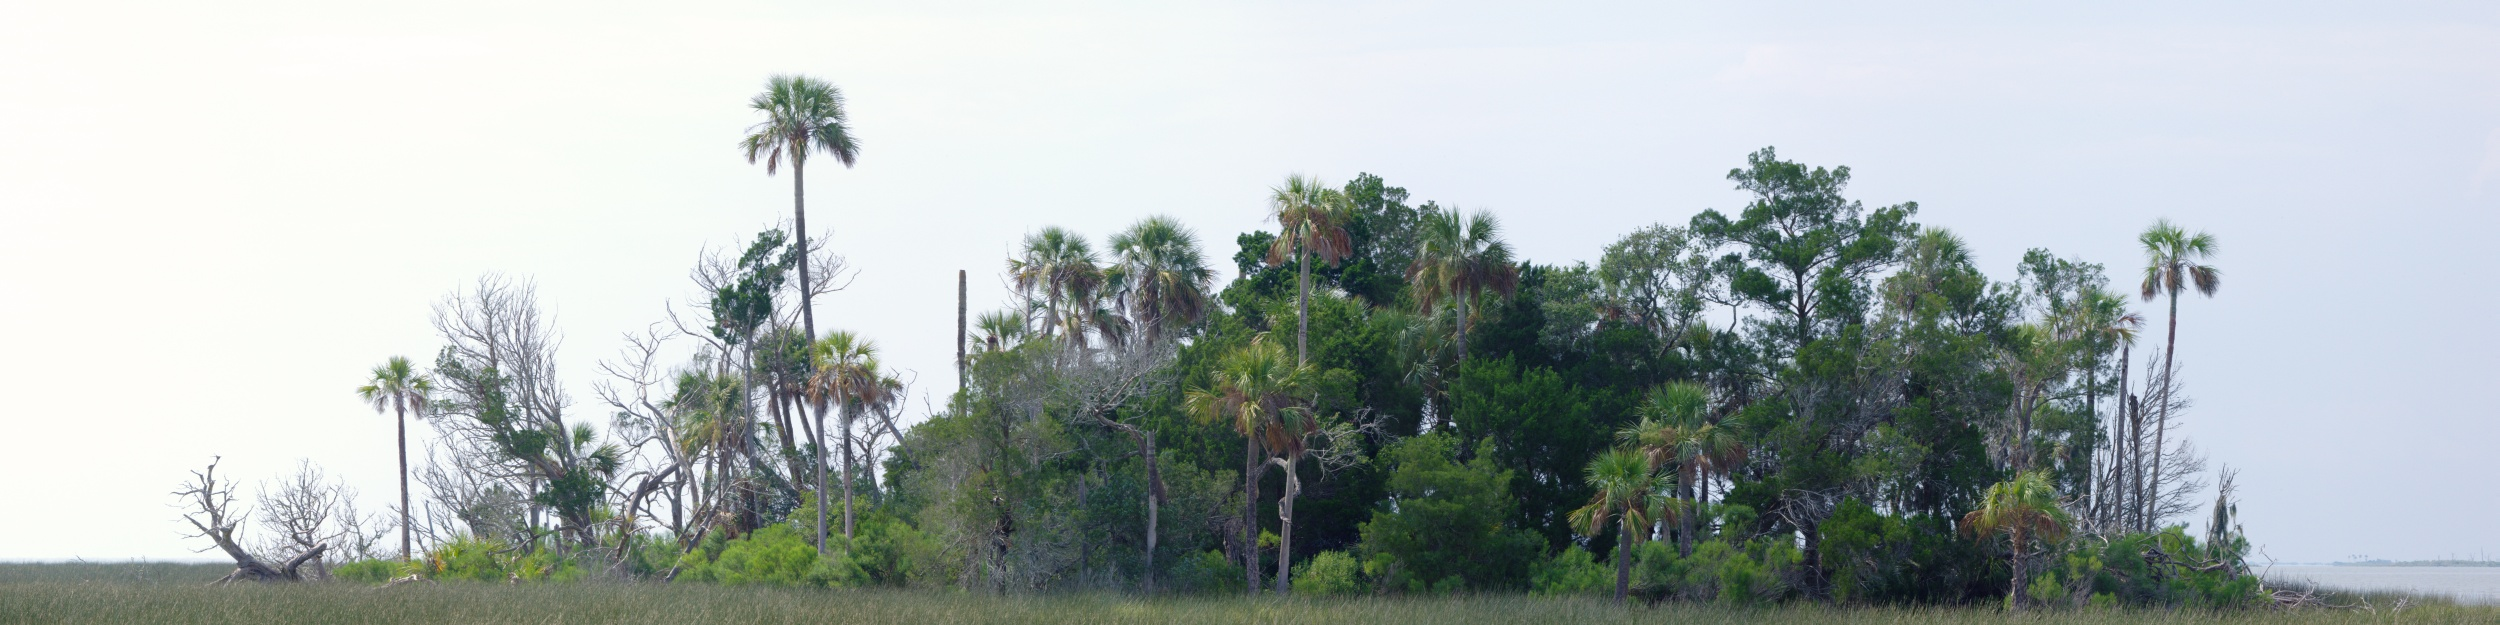 Tree Island, Withlacoochee River